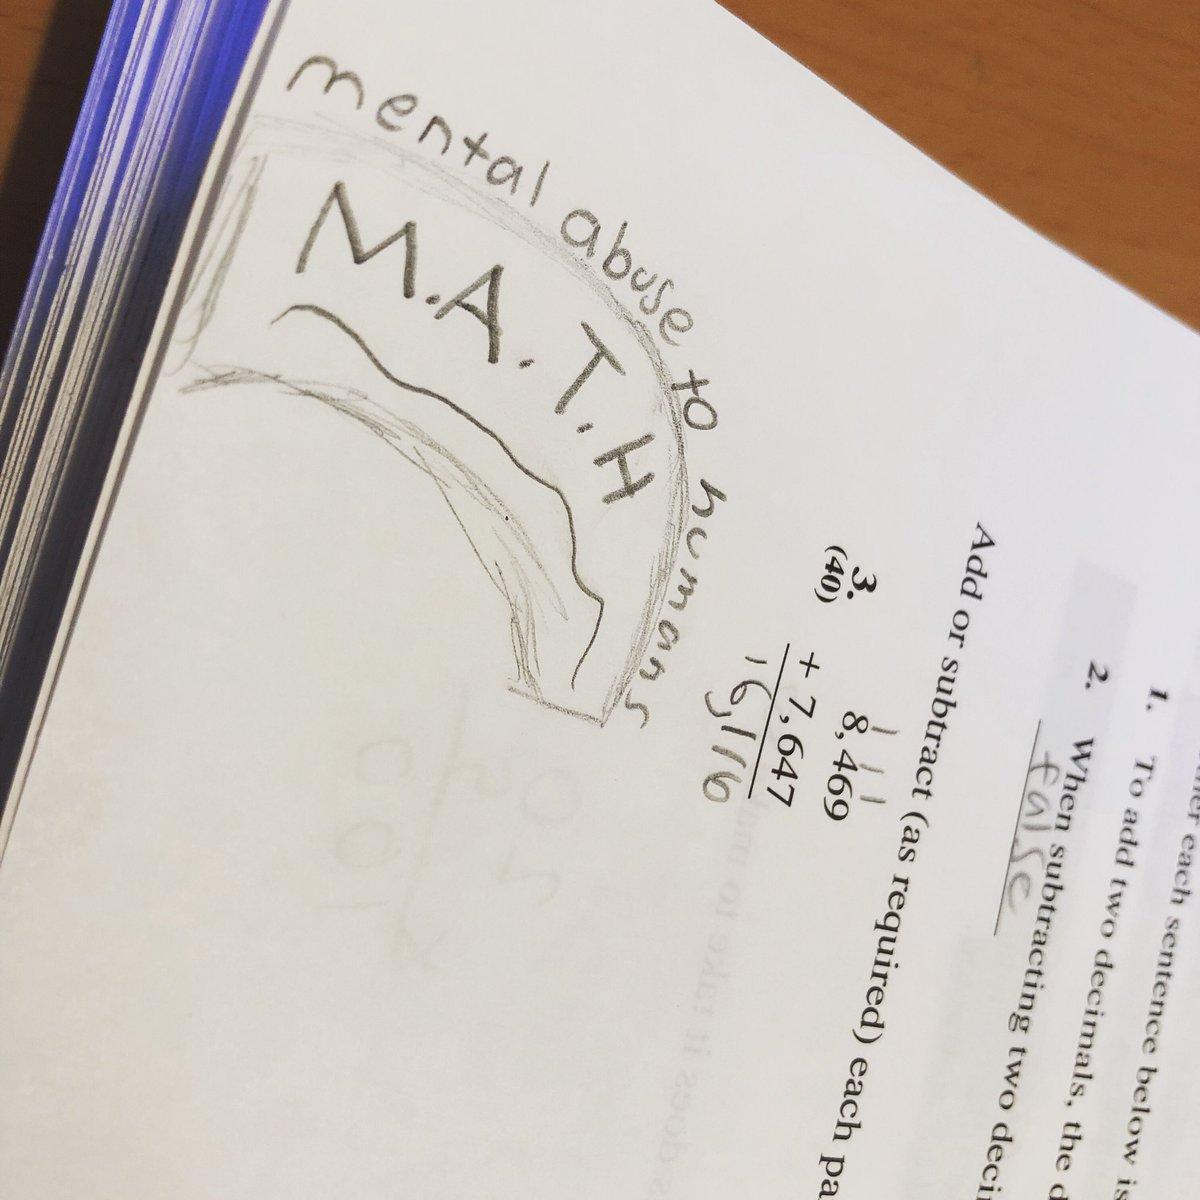 When your kid doodles in her math book 😅#homeschool #largefamily #familyvlog #youtubemom #vlog #largefamilymom #math #teachingtextbooks